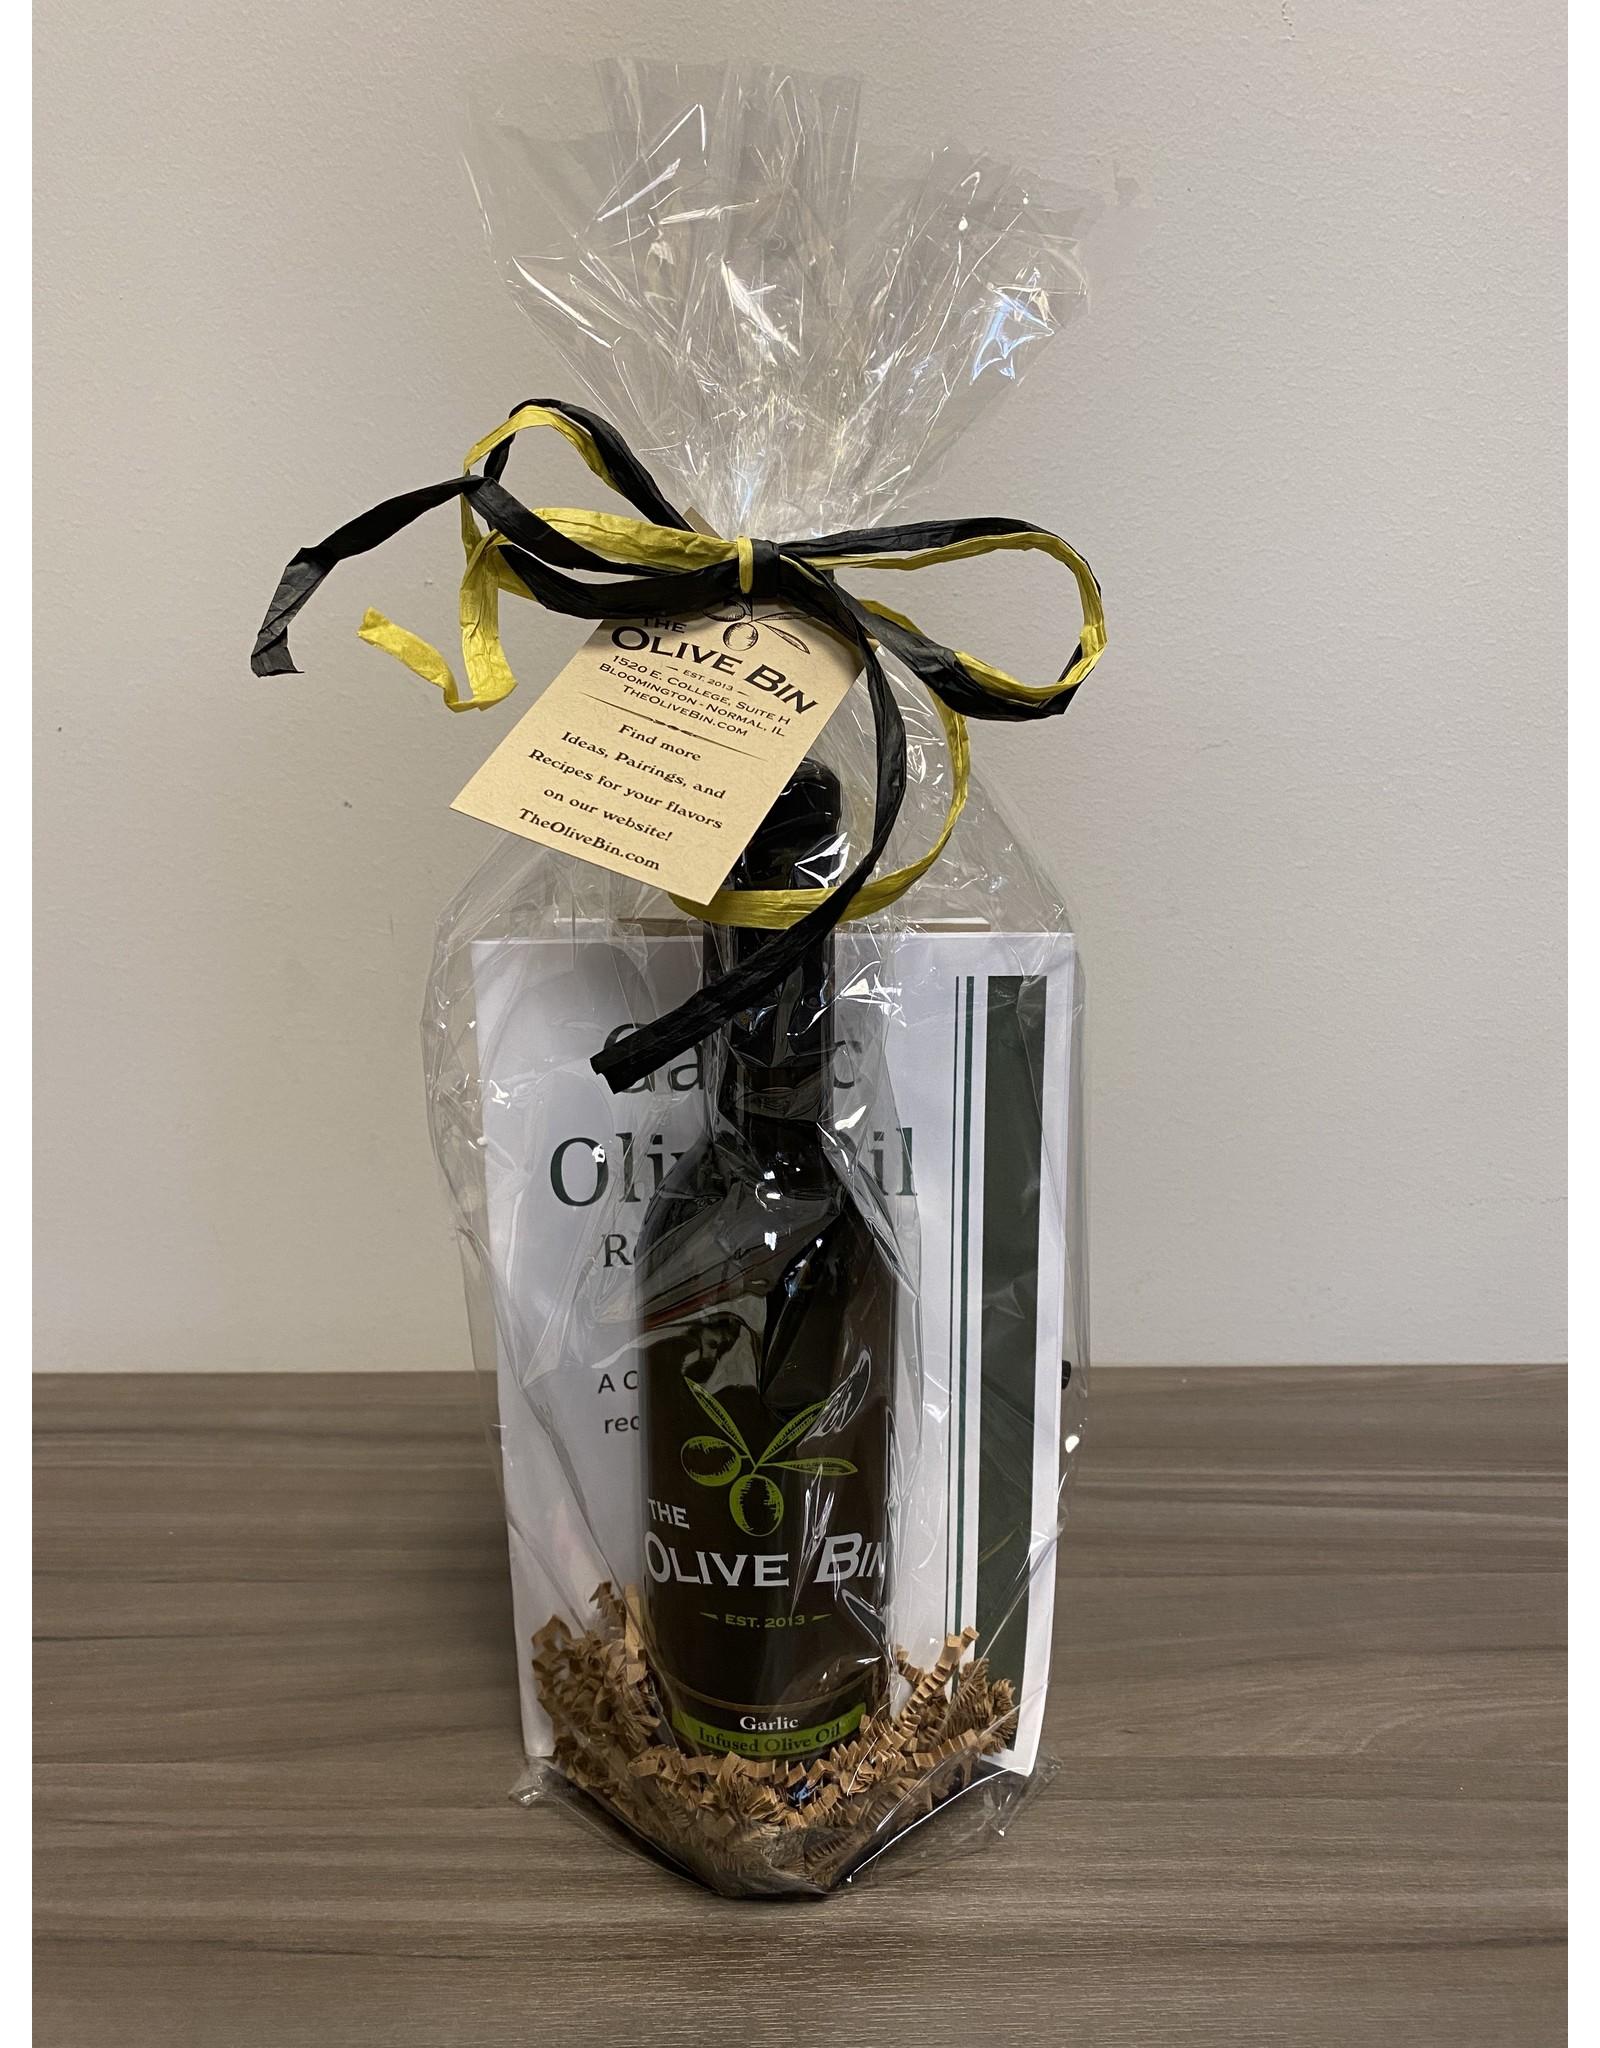 Garlic Olive Oil Recipe Set